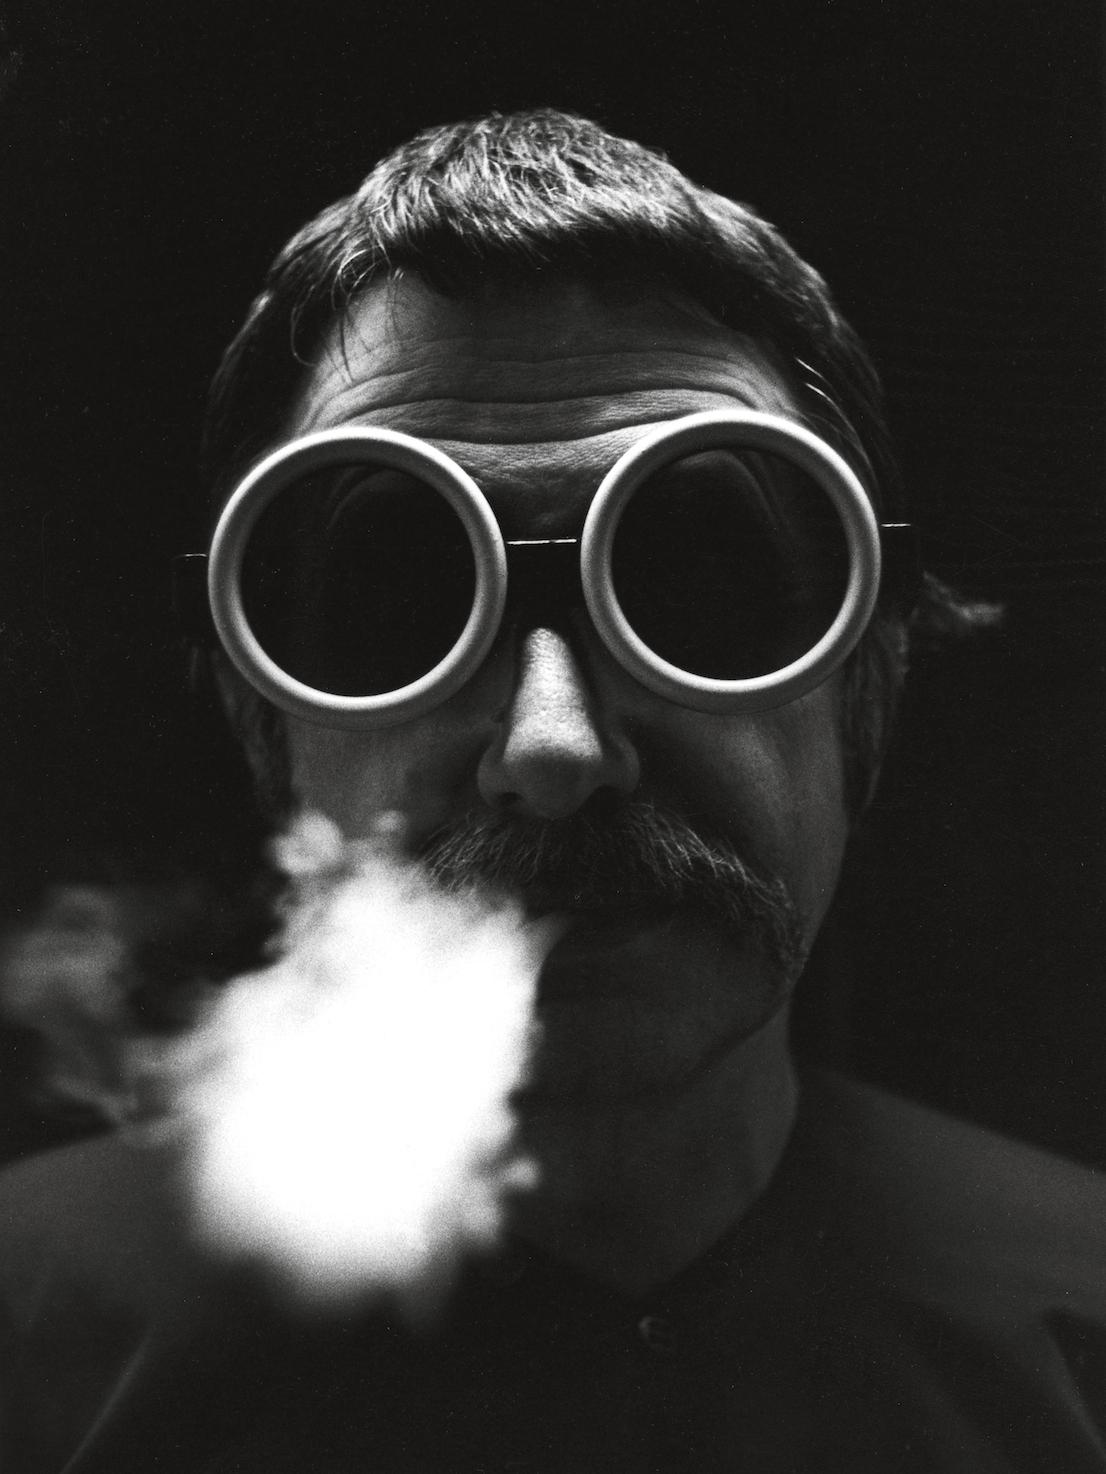 Ettore Sottsass, 1970 circa. © Ettore Sottsass e/and Barbara Radice. Courtesy Archivio Ettore Sottsass.